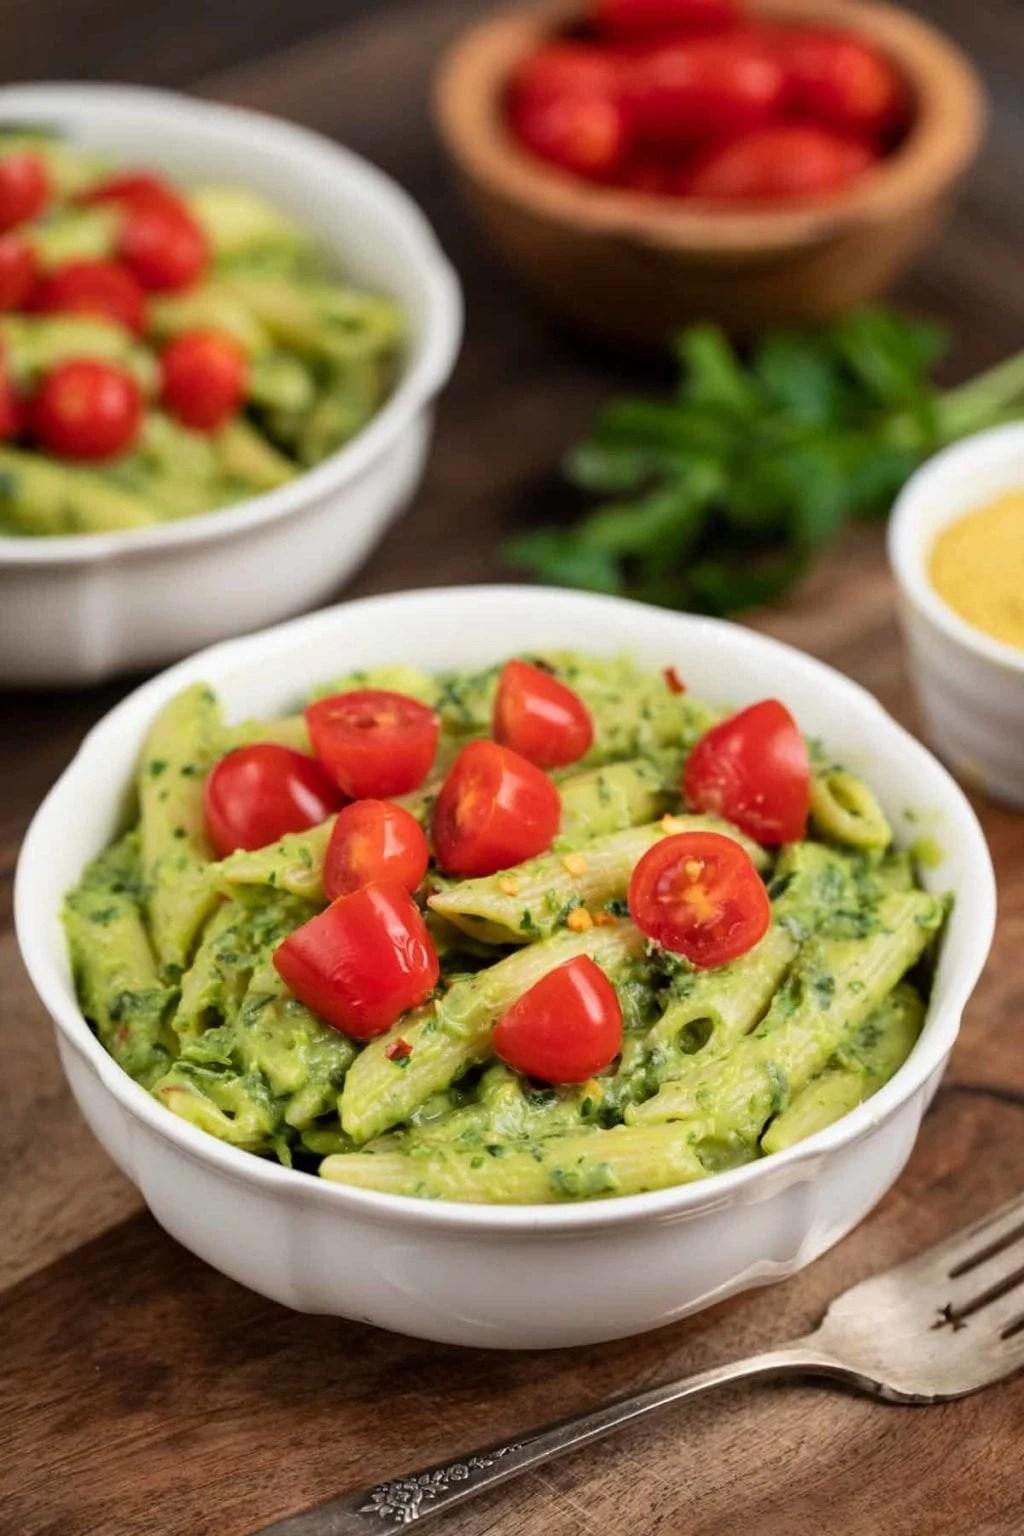 Avocado pasta in a bowl